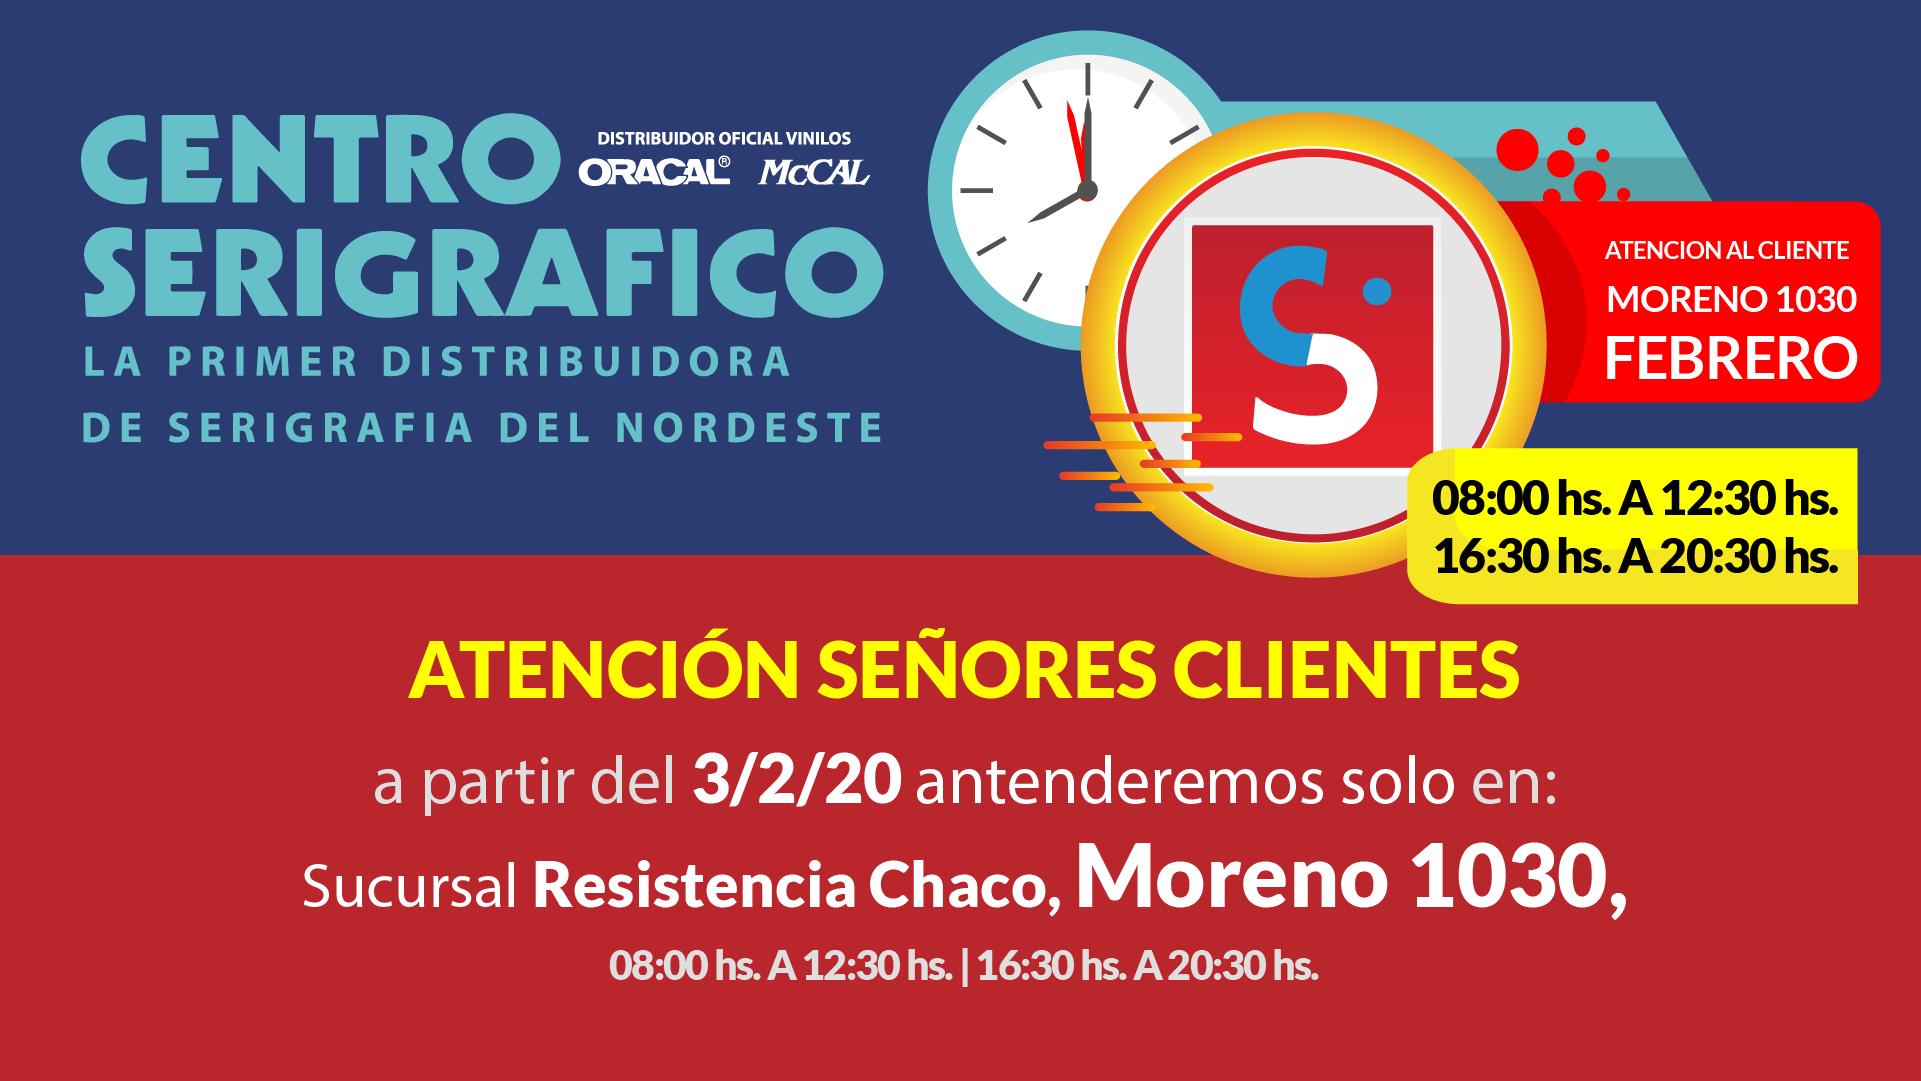 CENTROSERIGRAFICO_horario_FEBRERO2020-19